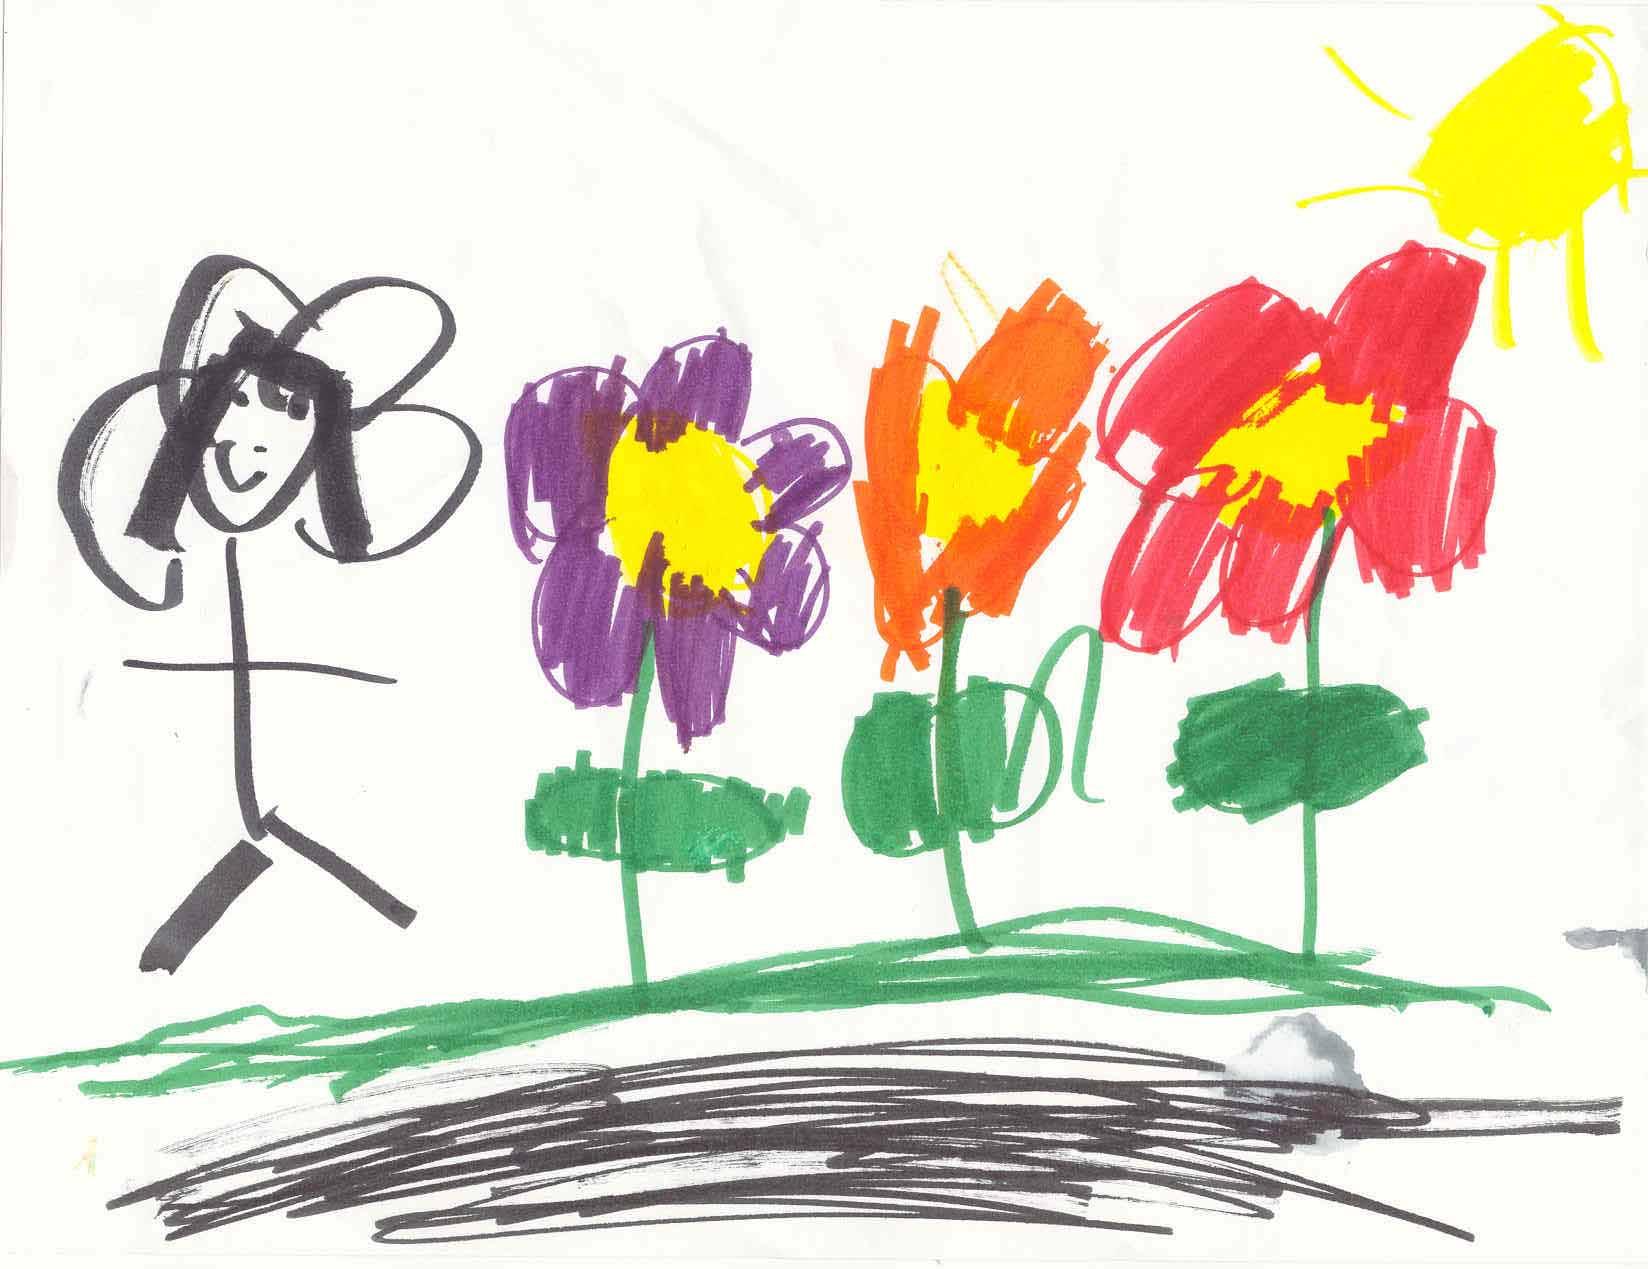 kidspic.jpg